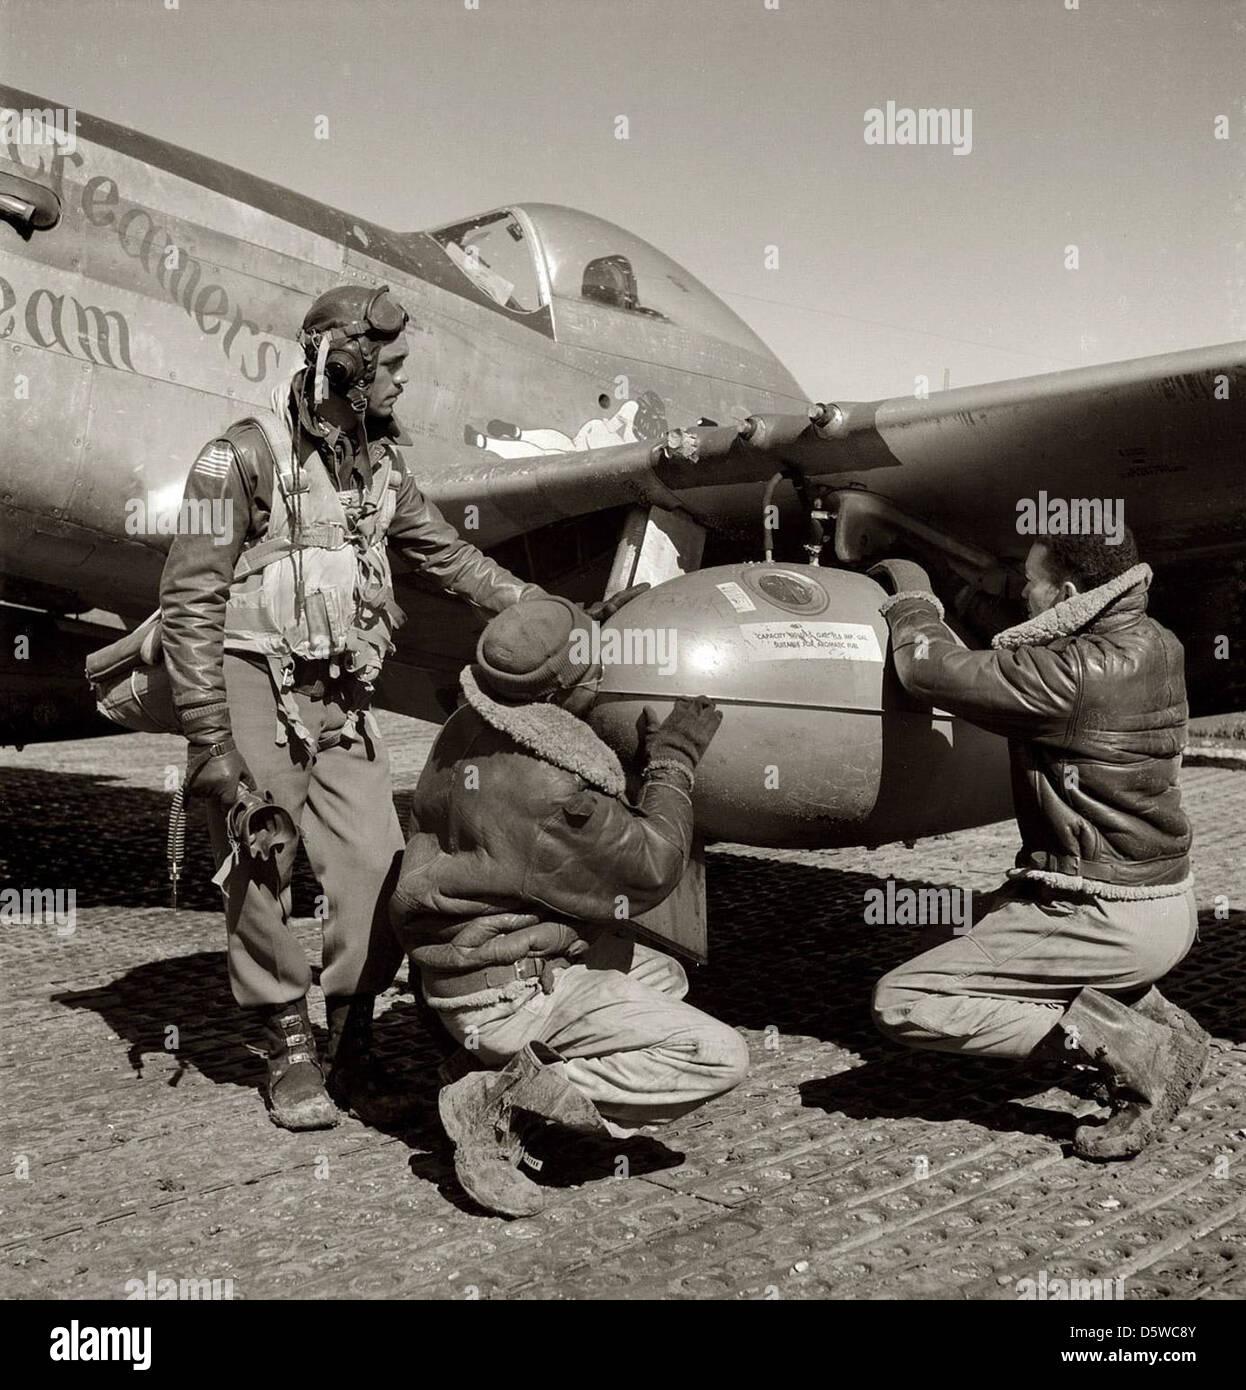 Edward C. pilotes Tuskegee Gleed avec le North American P-51 'Mustang' 'Creamer's Dream', 1945. Photo Stock